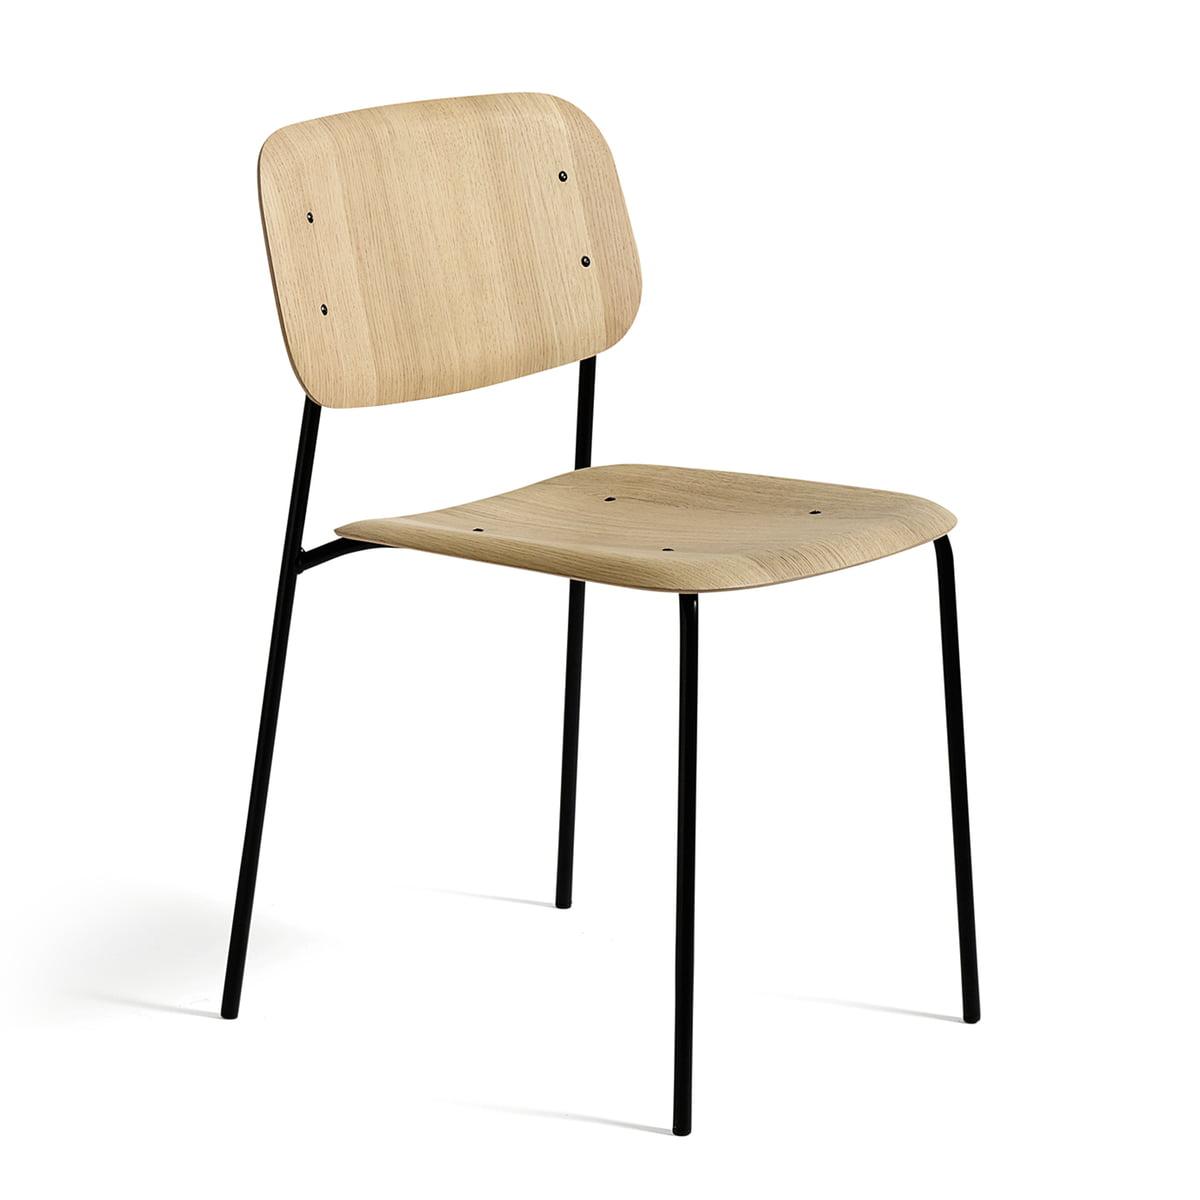 Chaise 12chêne mat Soft Edge verni Hay On0wPk